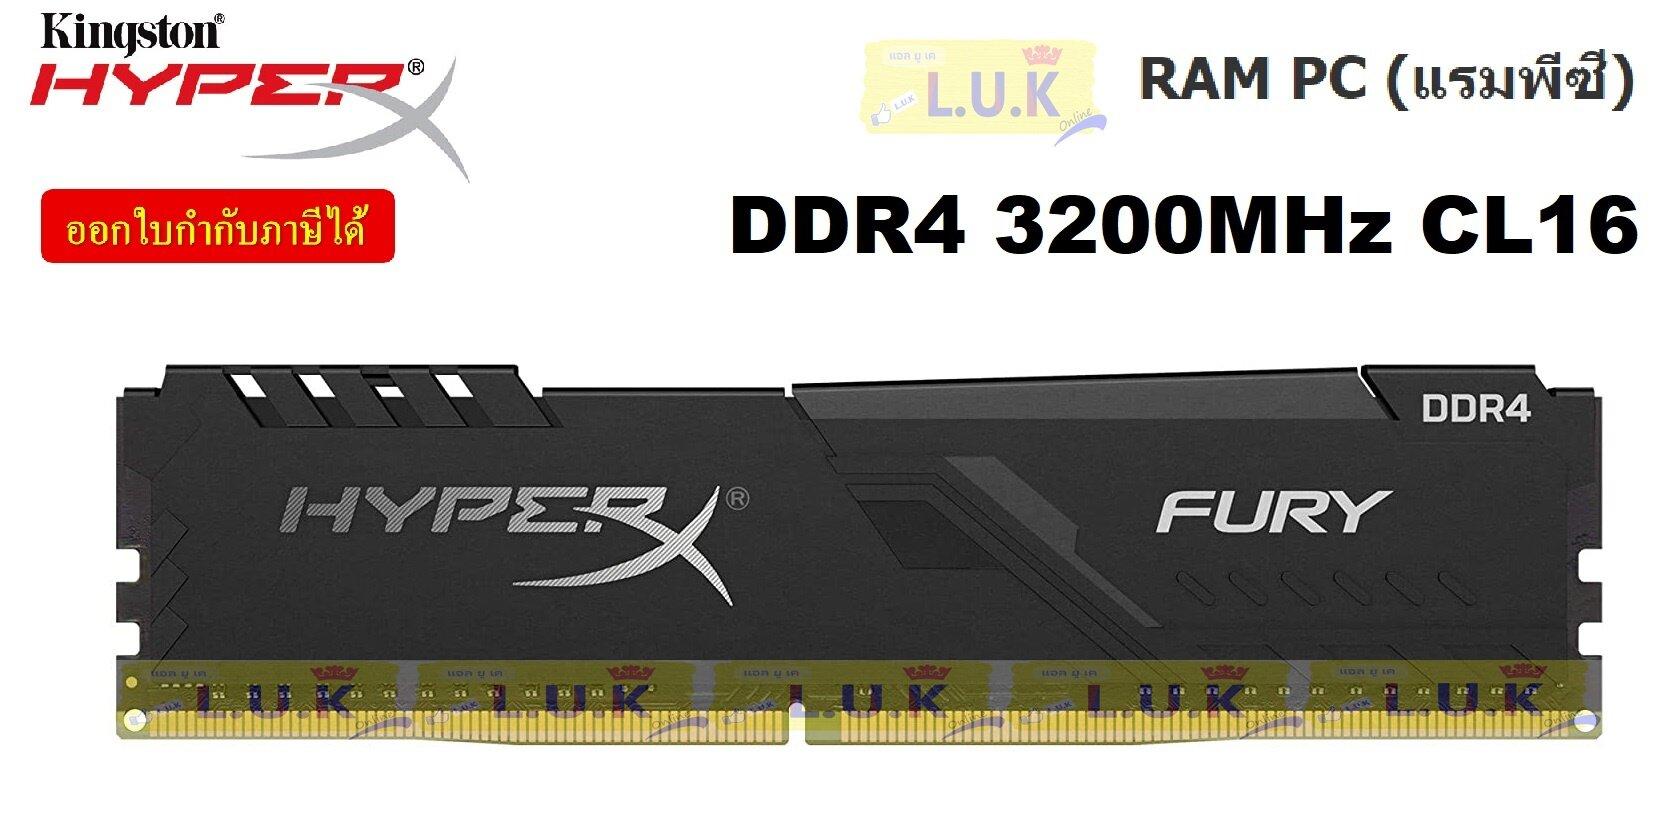 8gb (8gbx1) Ddr4/3200 Ram Pc (แรมพีซี) Kingston Hyperx Fury Black (hx432c16fb3/8) Cl16 - ประกันตลอดการใช้งาน.